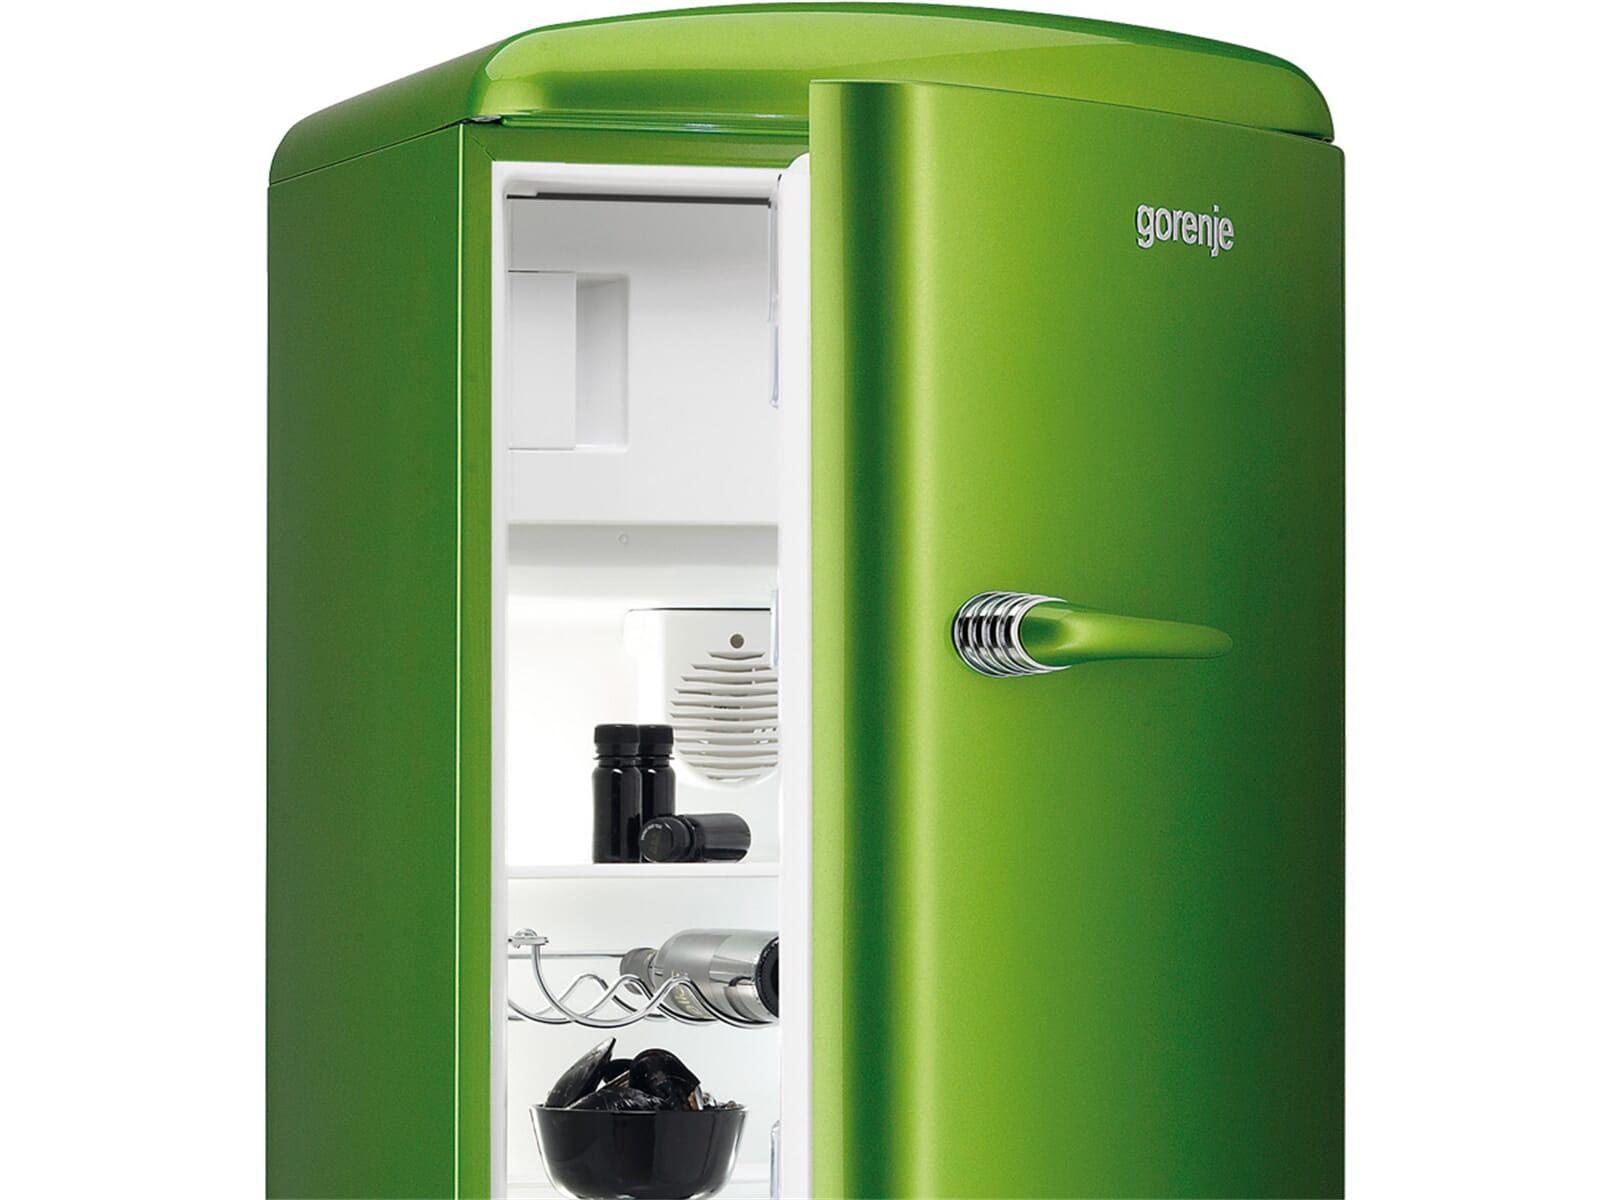 Smeg Kühlschrank Grün : Retro kühlschrank grün kühlschränke online auf rechnung raten